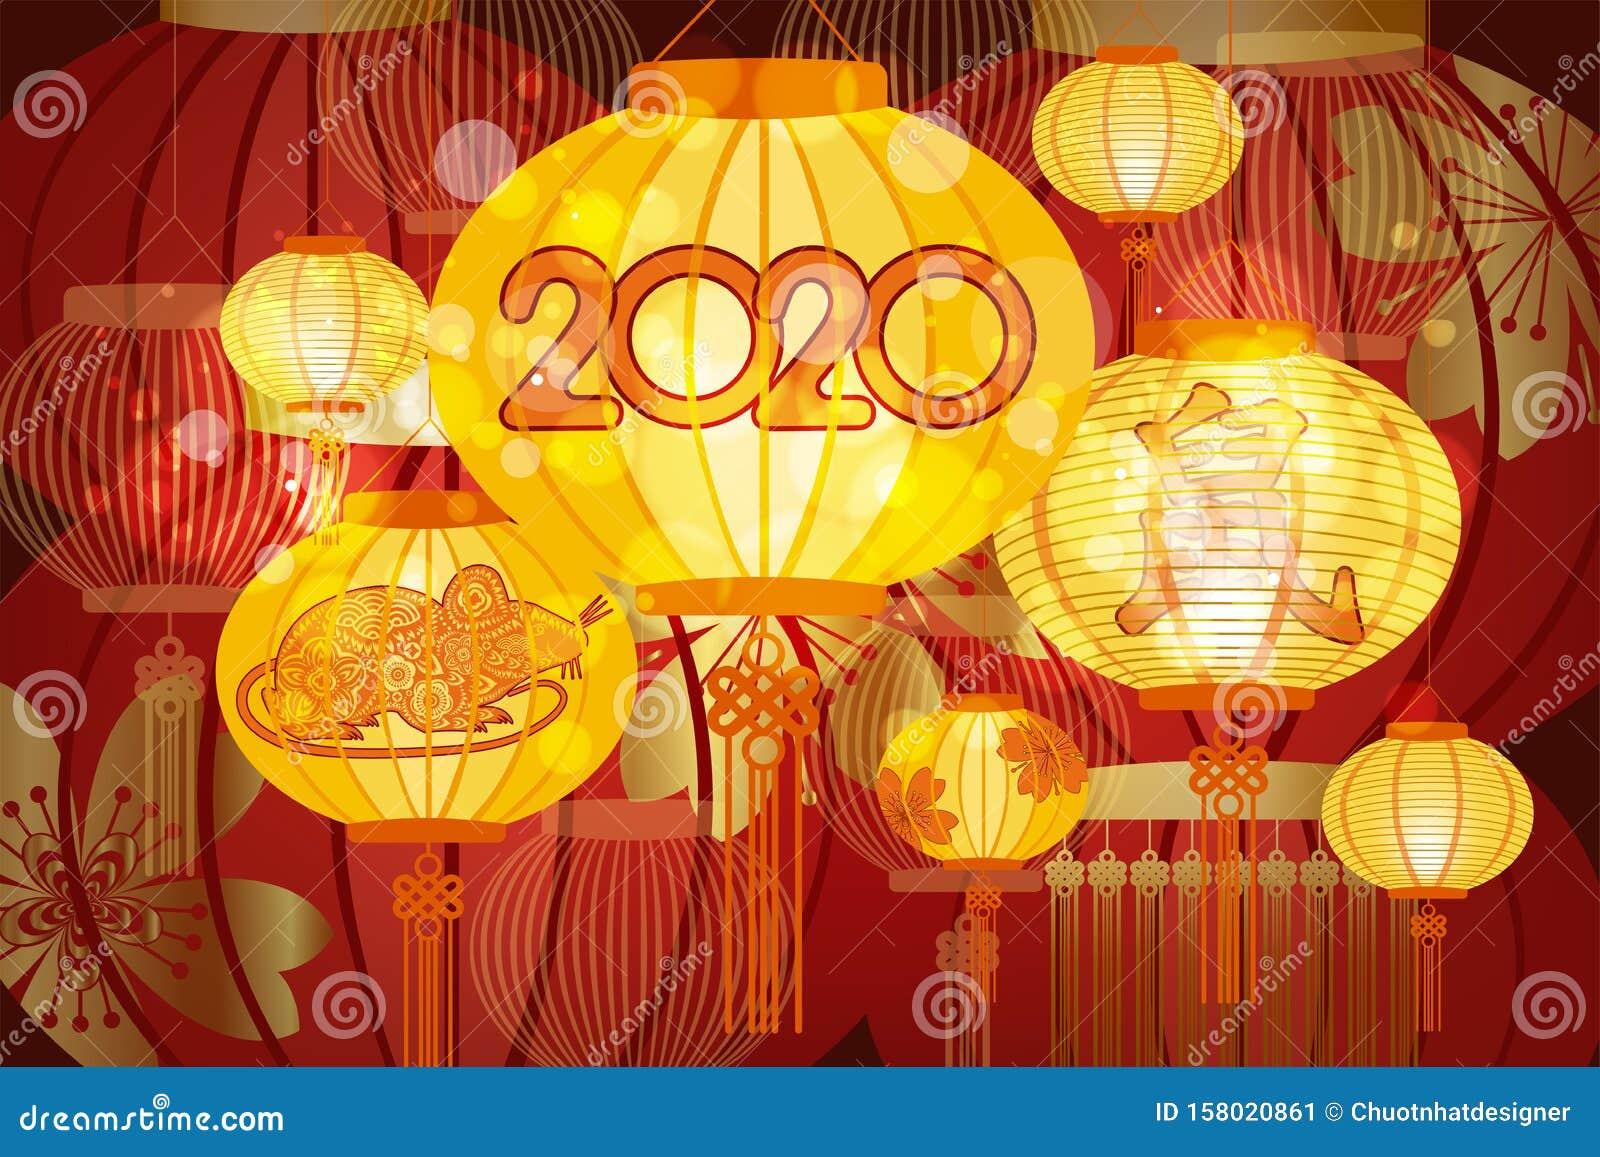 Chinese Lantern Festival 2020.Chinese Lanterns During New Year Festival Chinese New Year